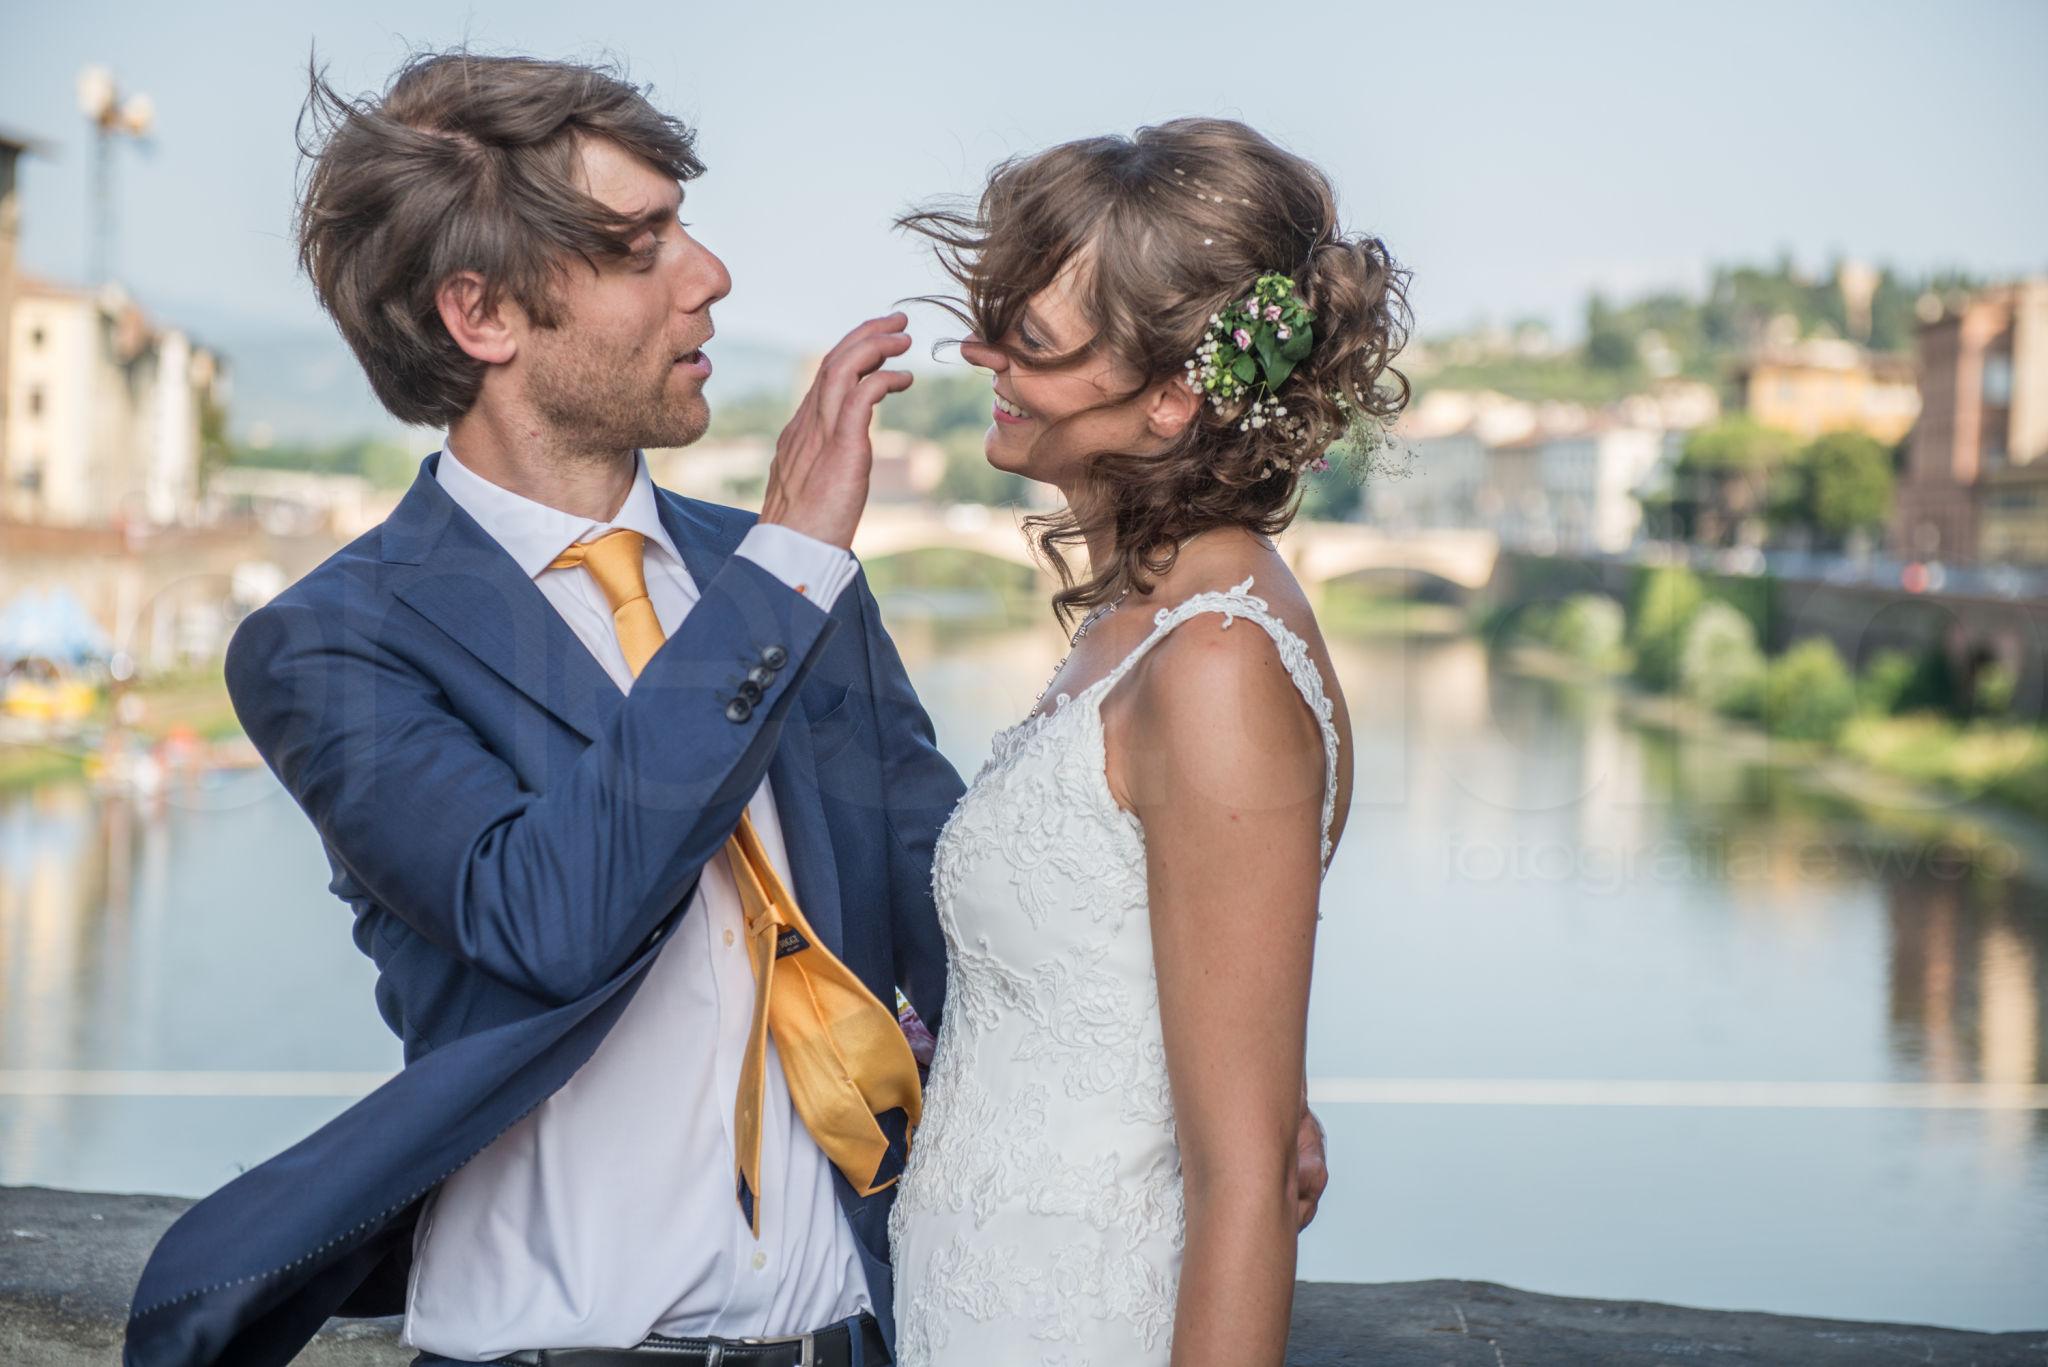 http://lnx.mirkone.it/wp-content/uploads/2015/07/fotografo-matrimoni-faenza-0025-2.jpg